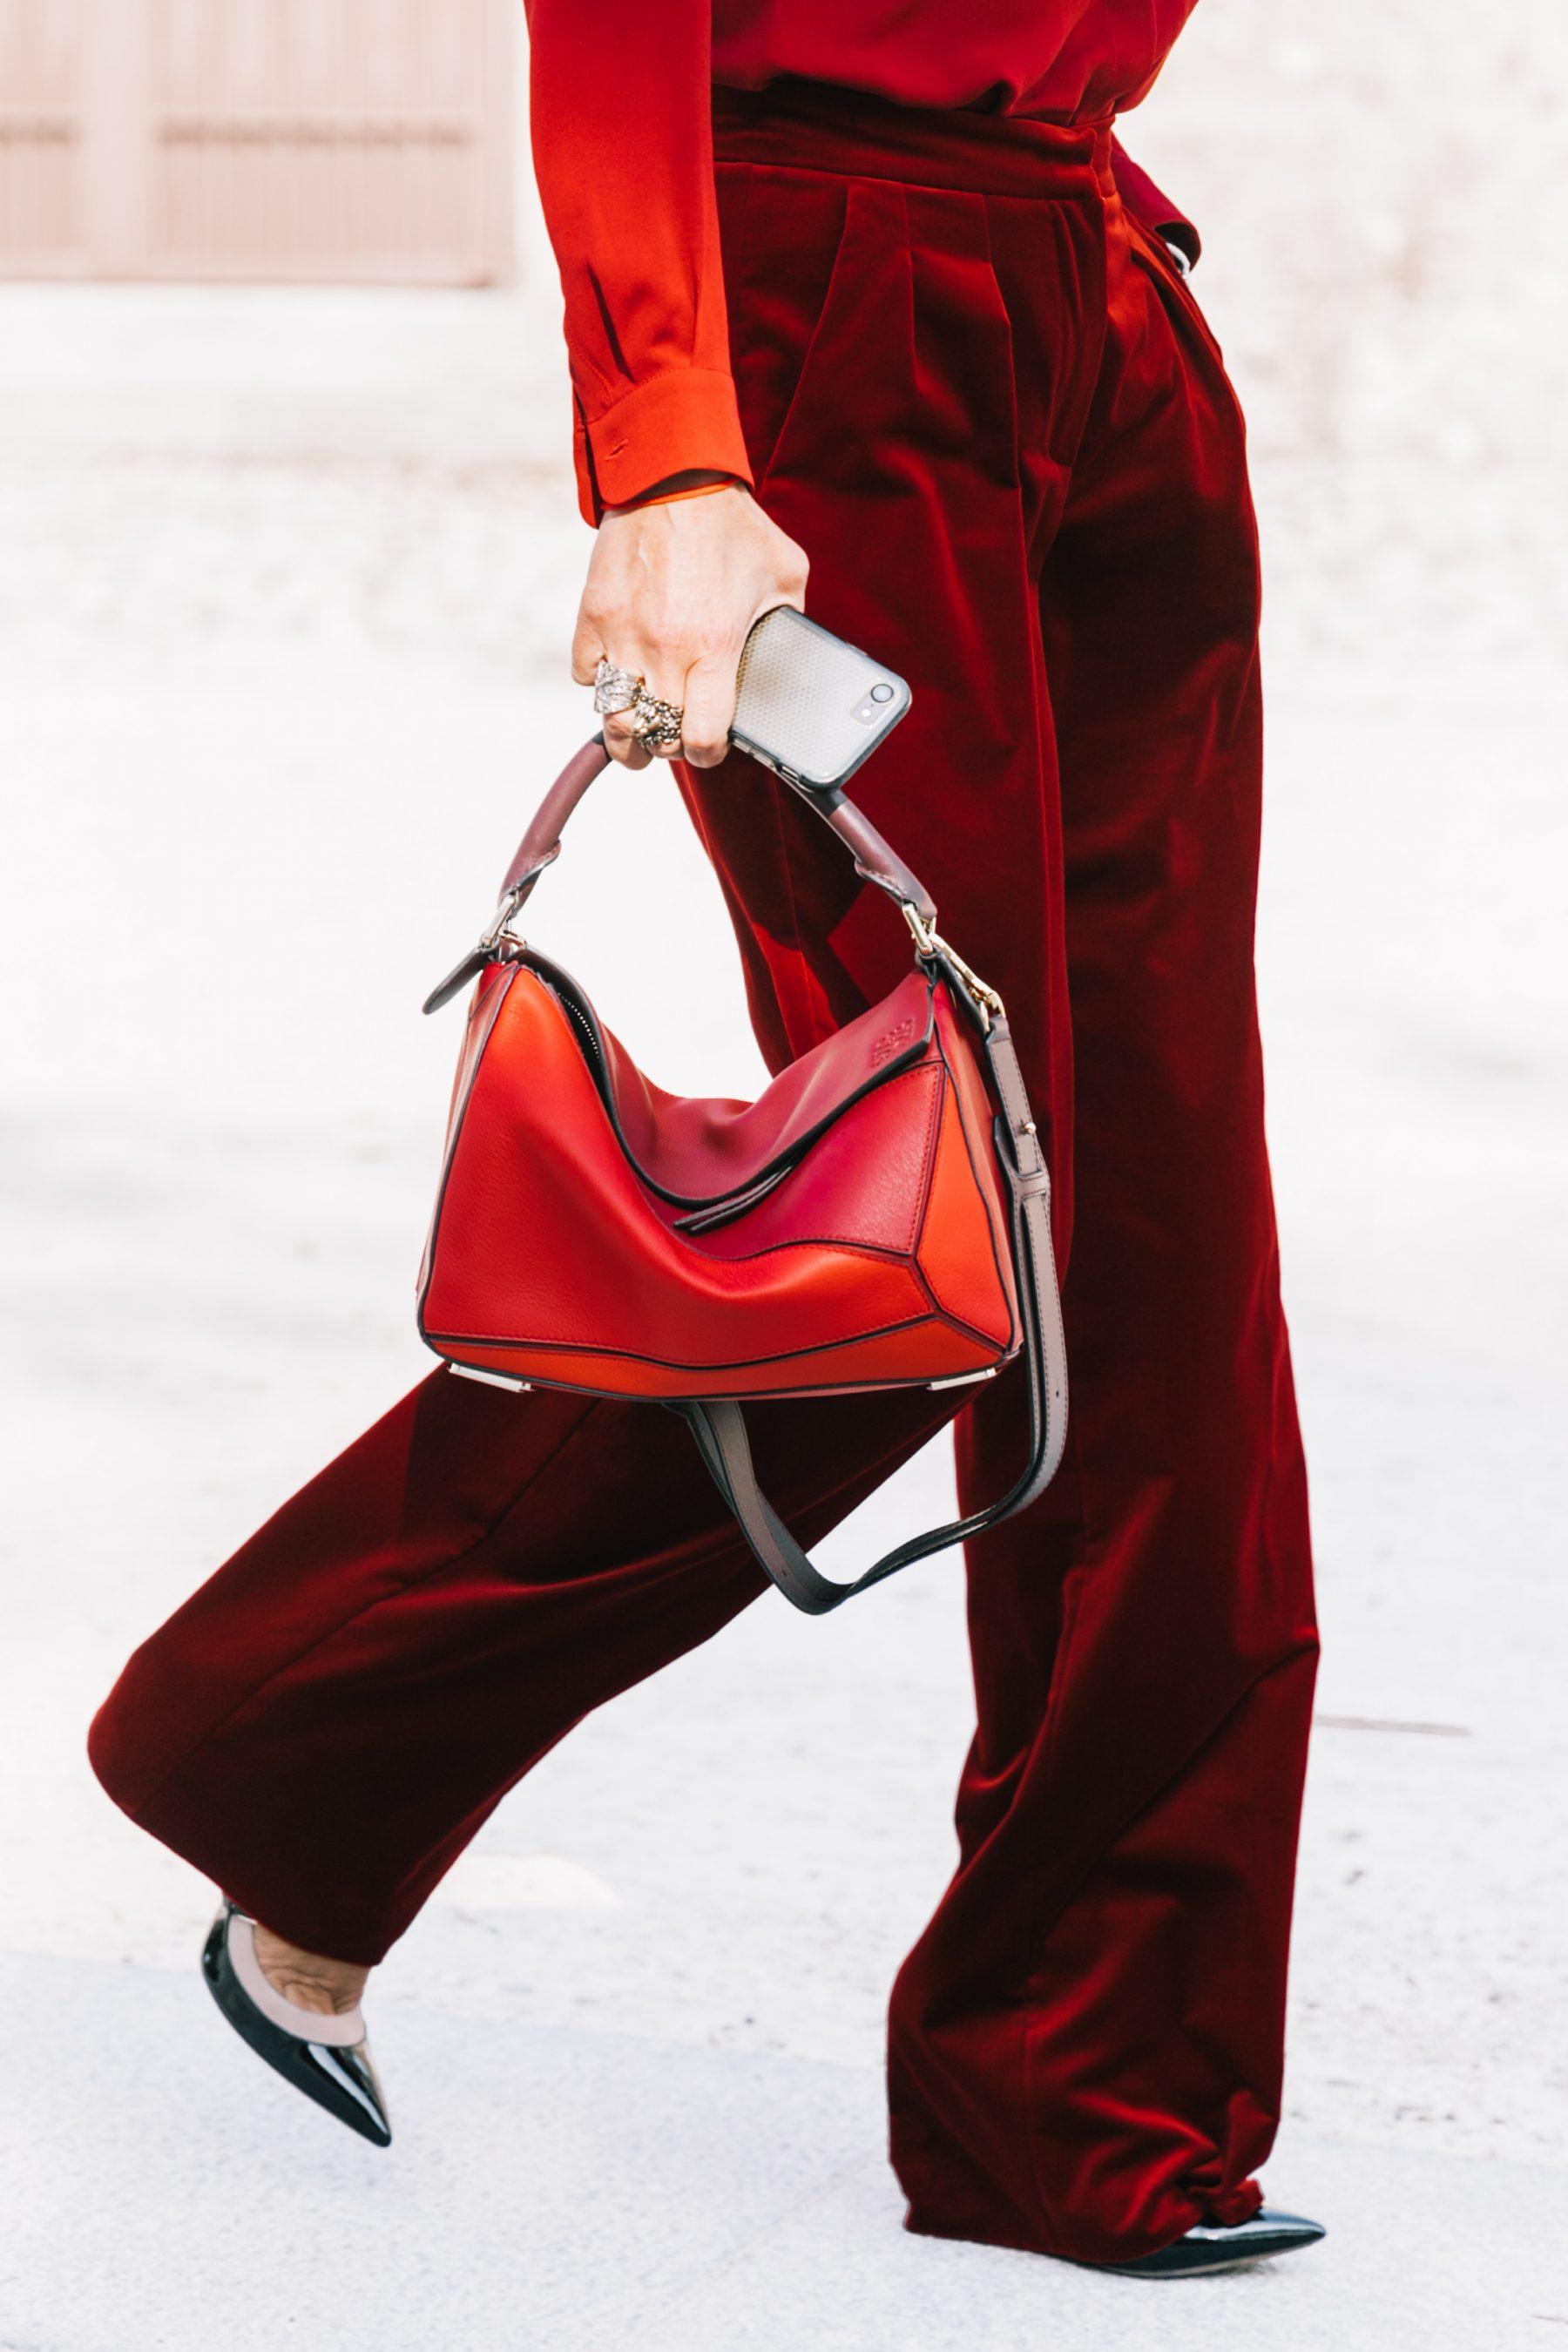 ROSE & IVY Journal Sparkle & Shine Festive Fashion for the Holidays